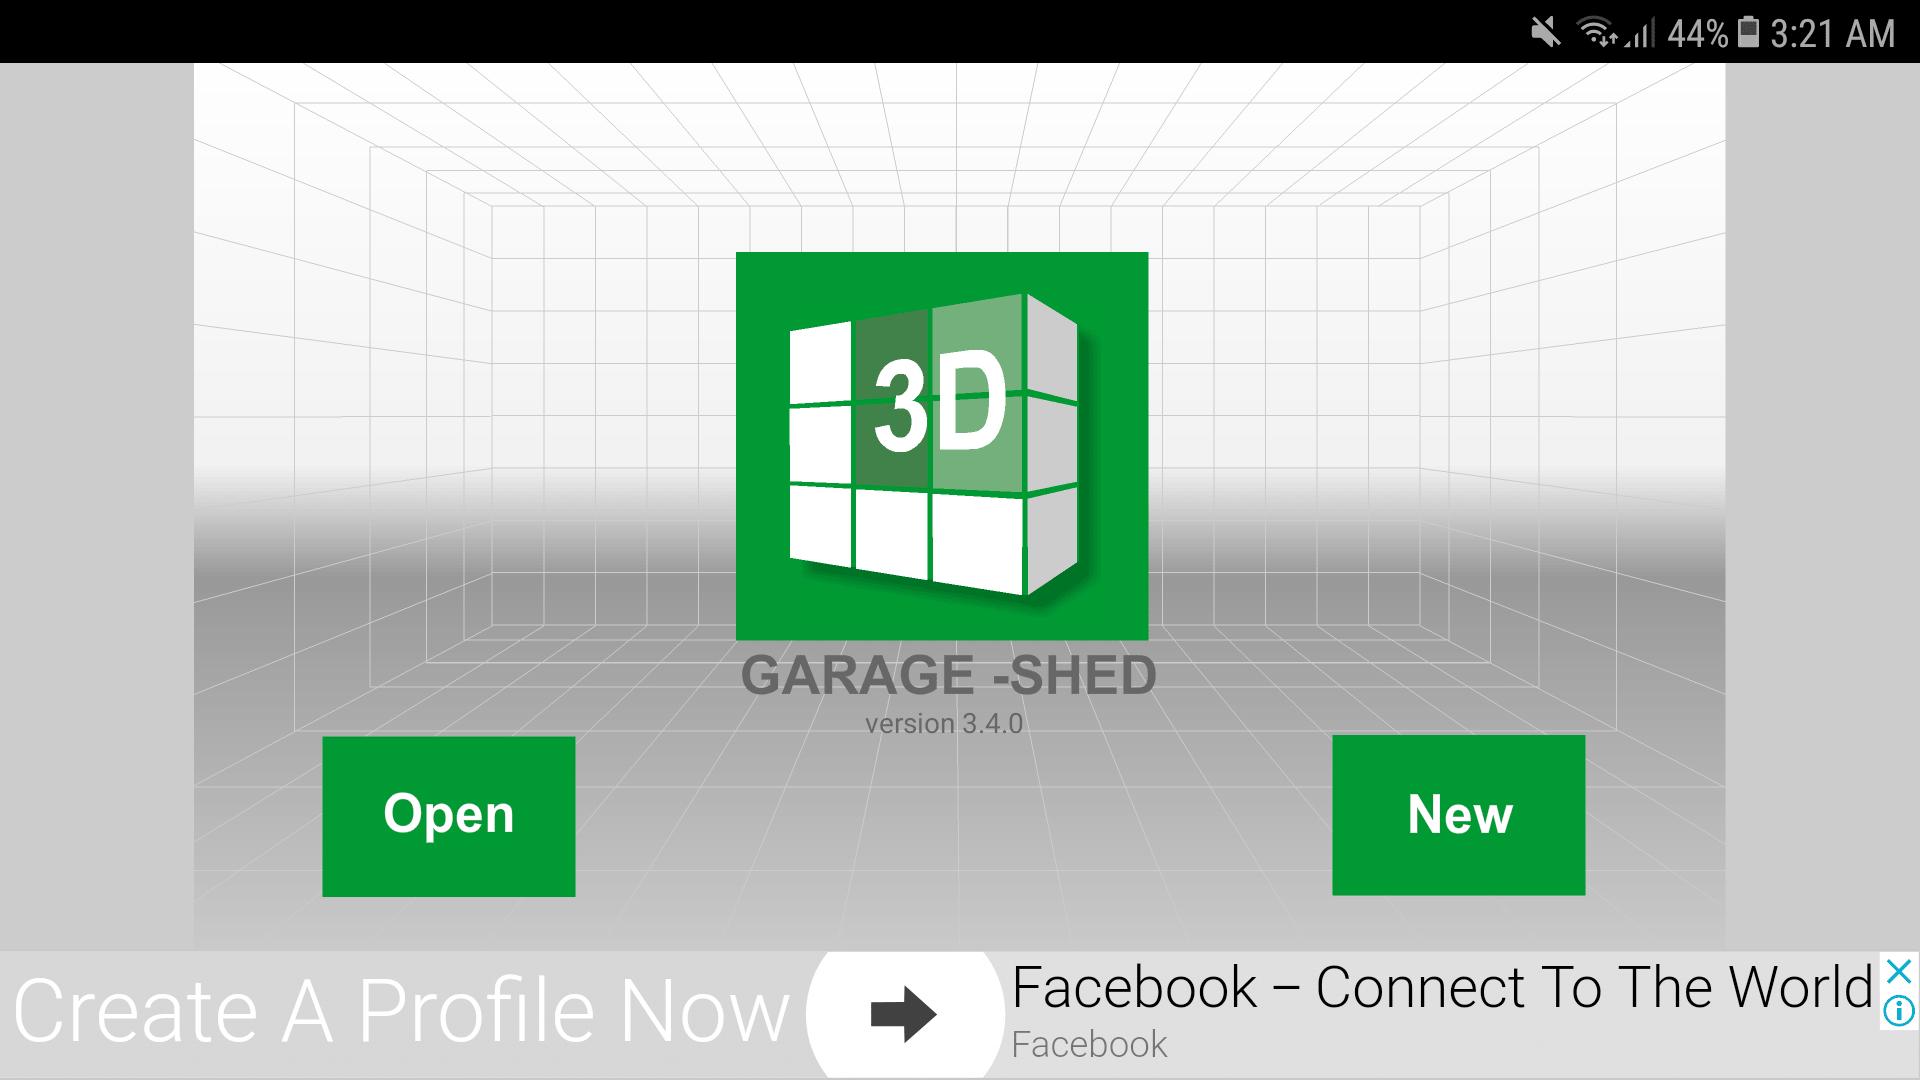 Udesignit 3D Garage Shed Home Screen